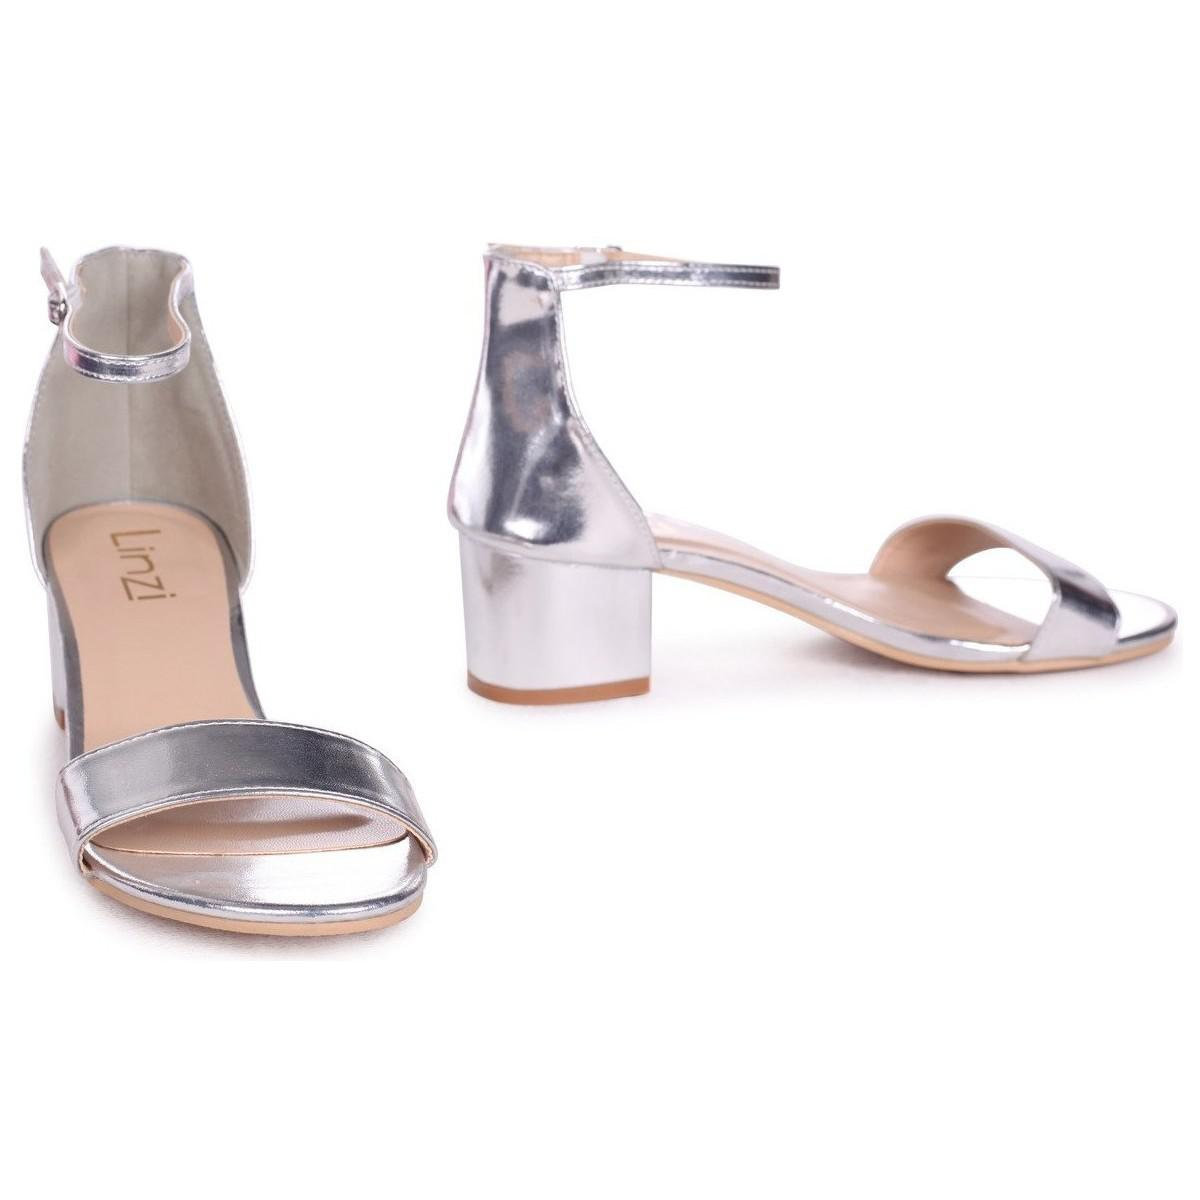 cd028cd73fb Linzi Nadine Women's Sandals In Silver in Metallic - Lyst